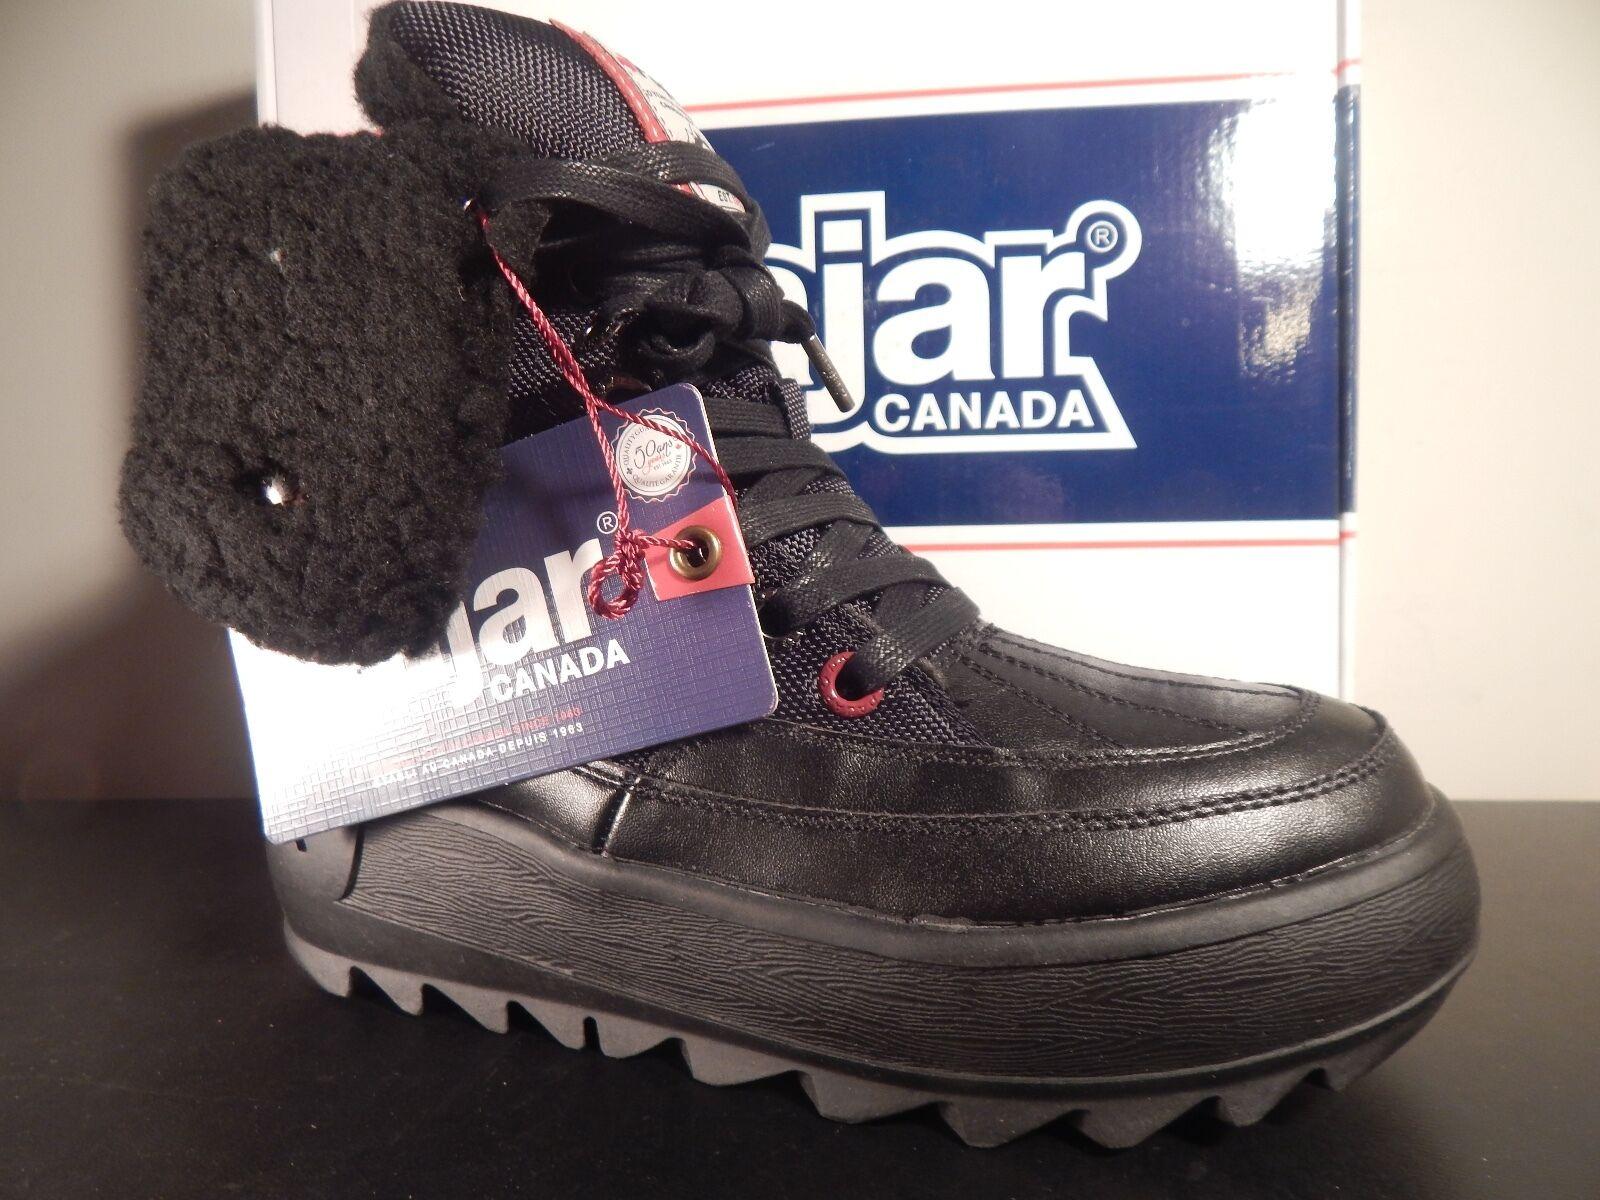 175 Pajar Canada PRINCESS Damenschuhe Waterproof Winter boots Größe 41 9.5-10 NWB